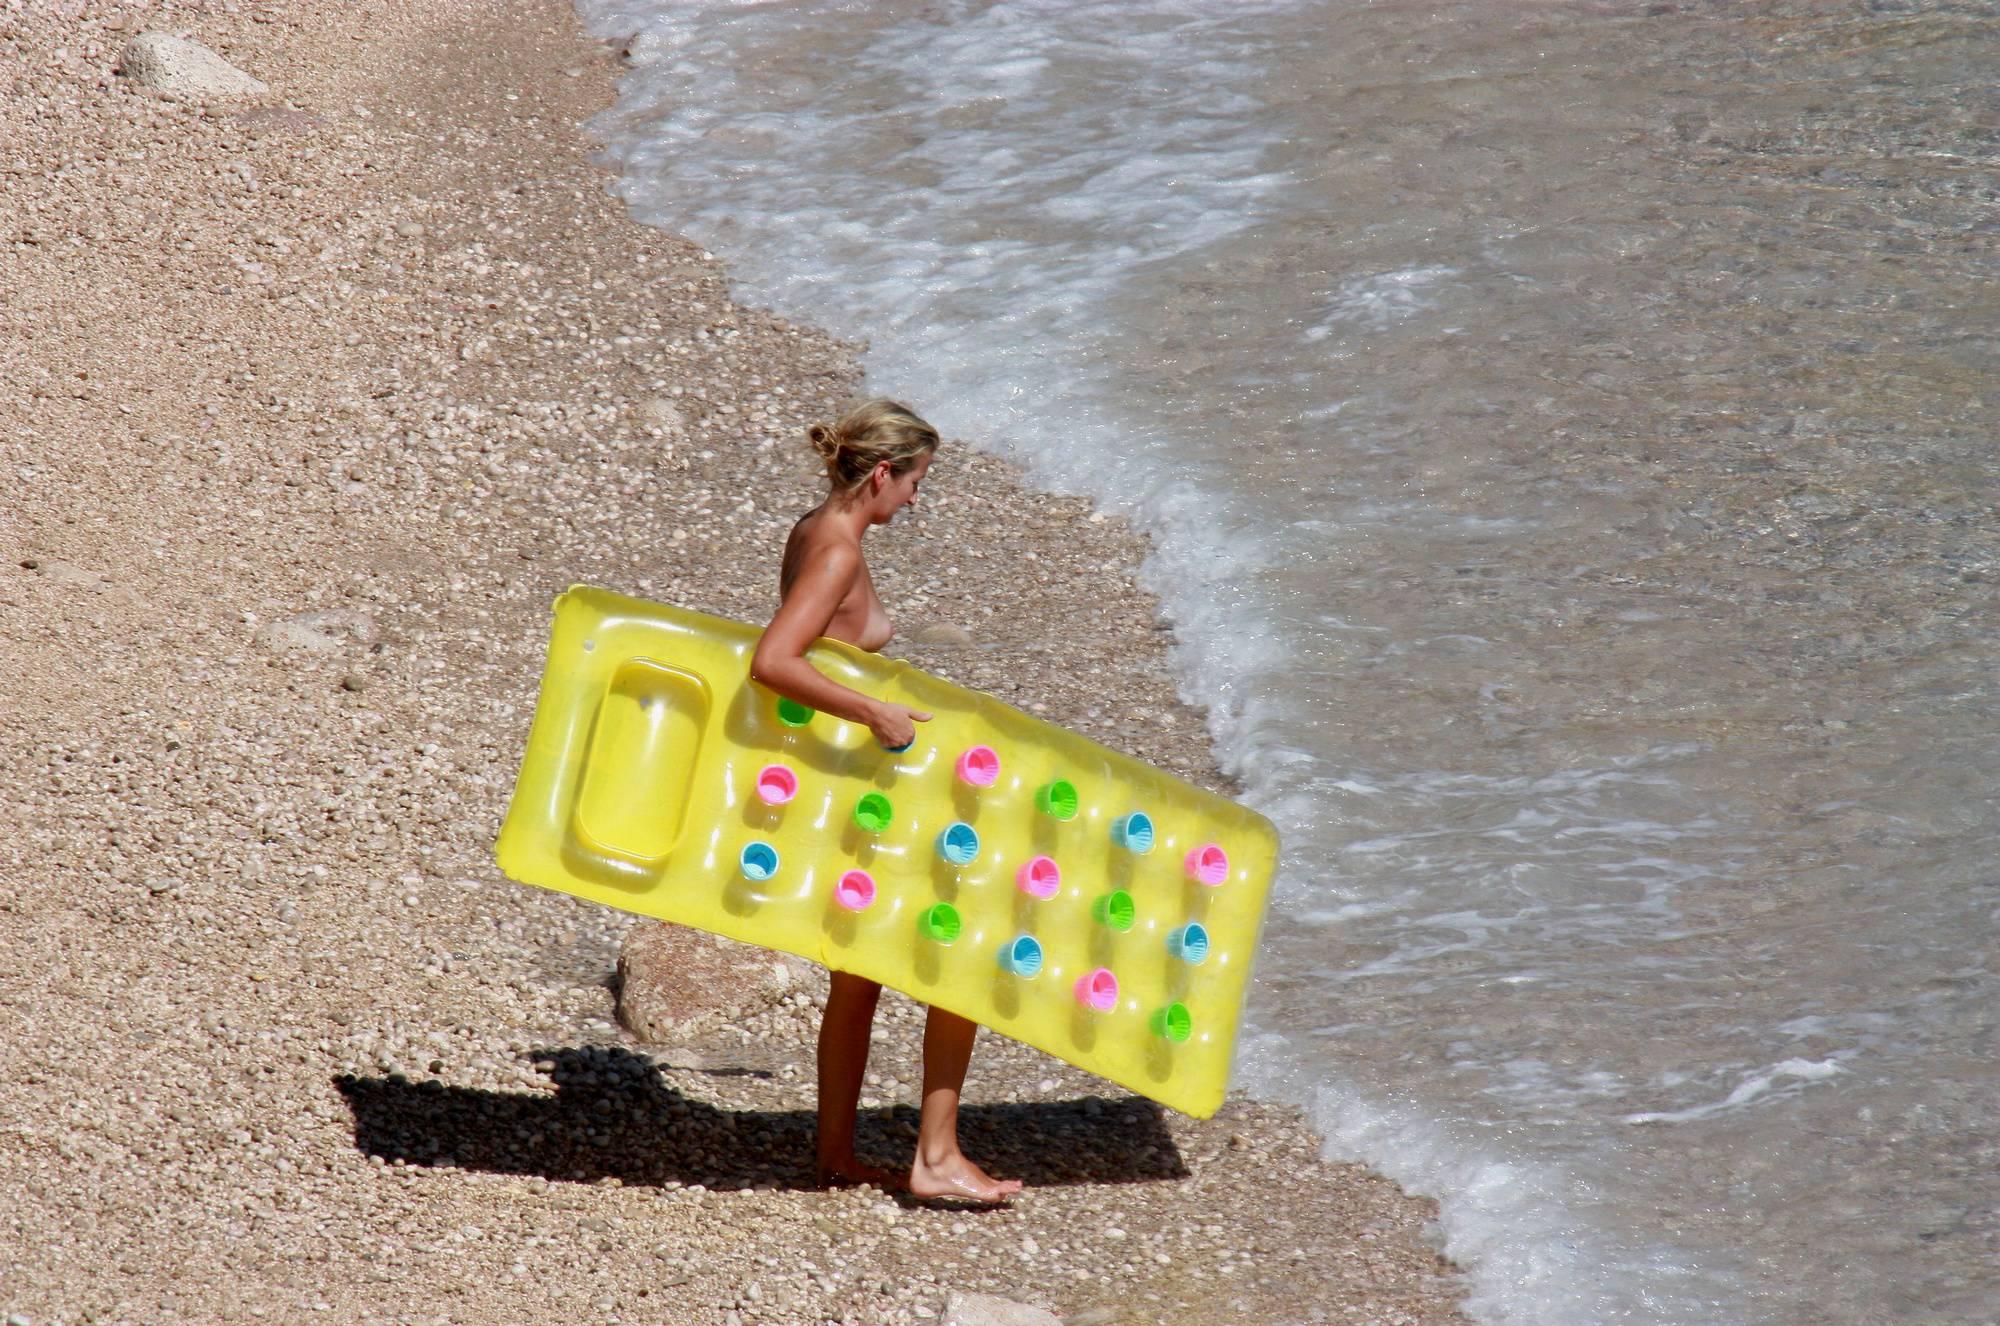 Purenudism Images-Nudist Yellow Beach Girls - 3